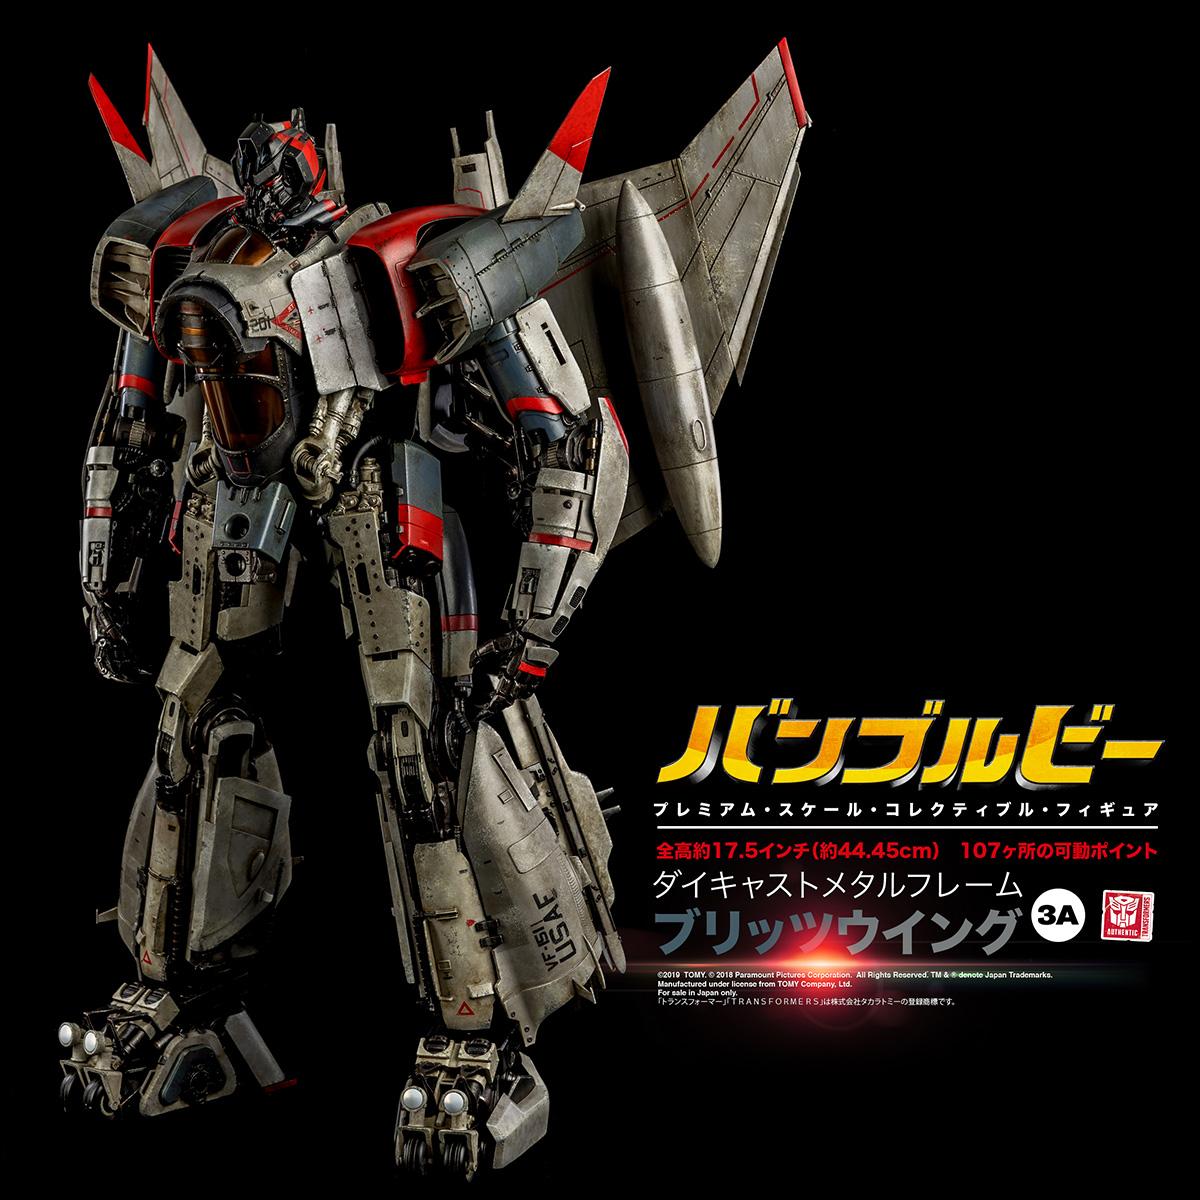 Blitzwing_PM_JAP_1101.jpg